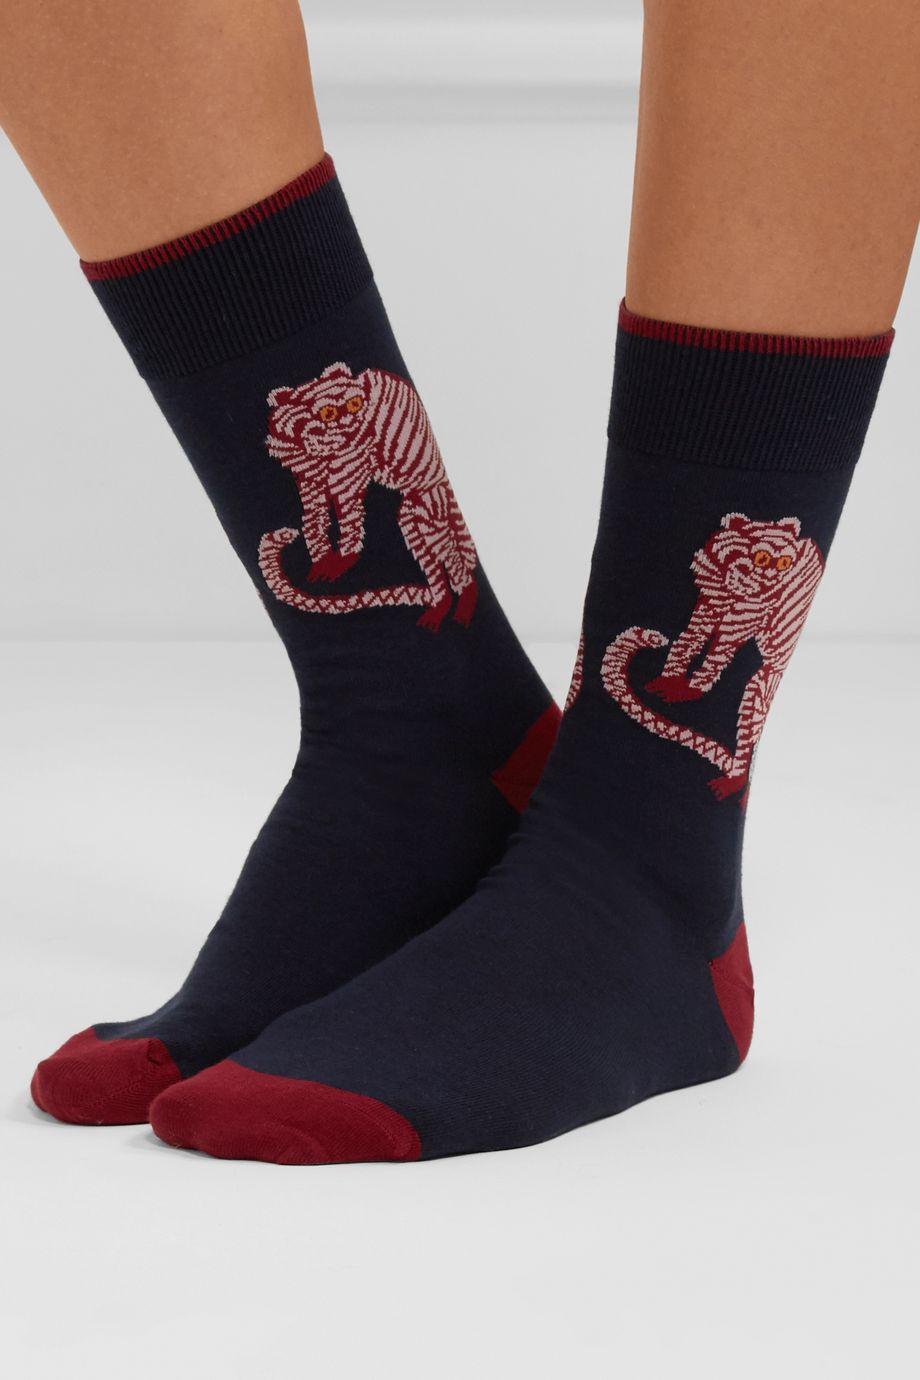 Desmond & Dempsey Mexico set of three cotton-blend socks